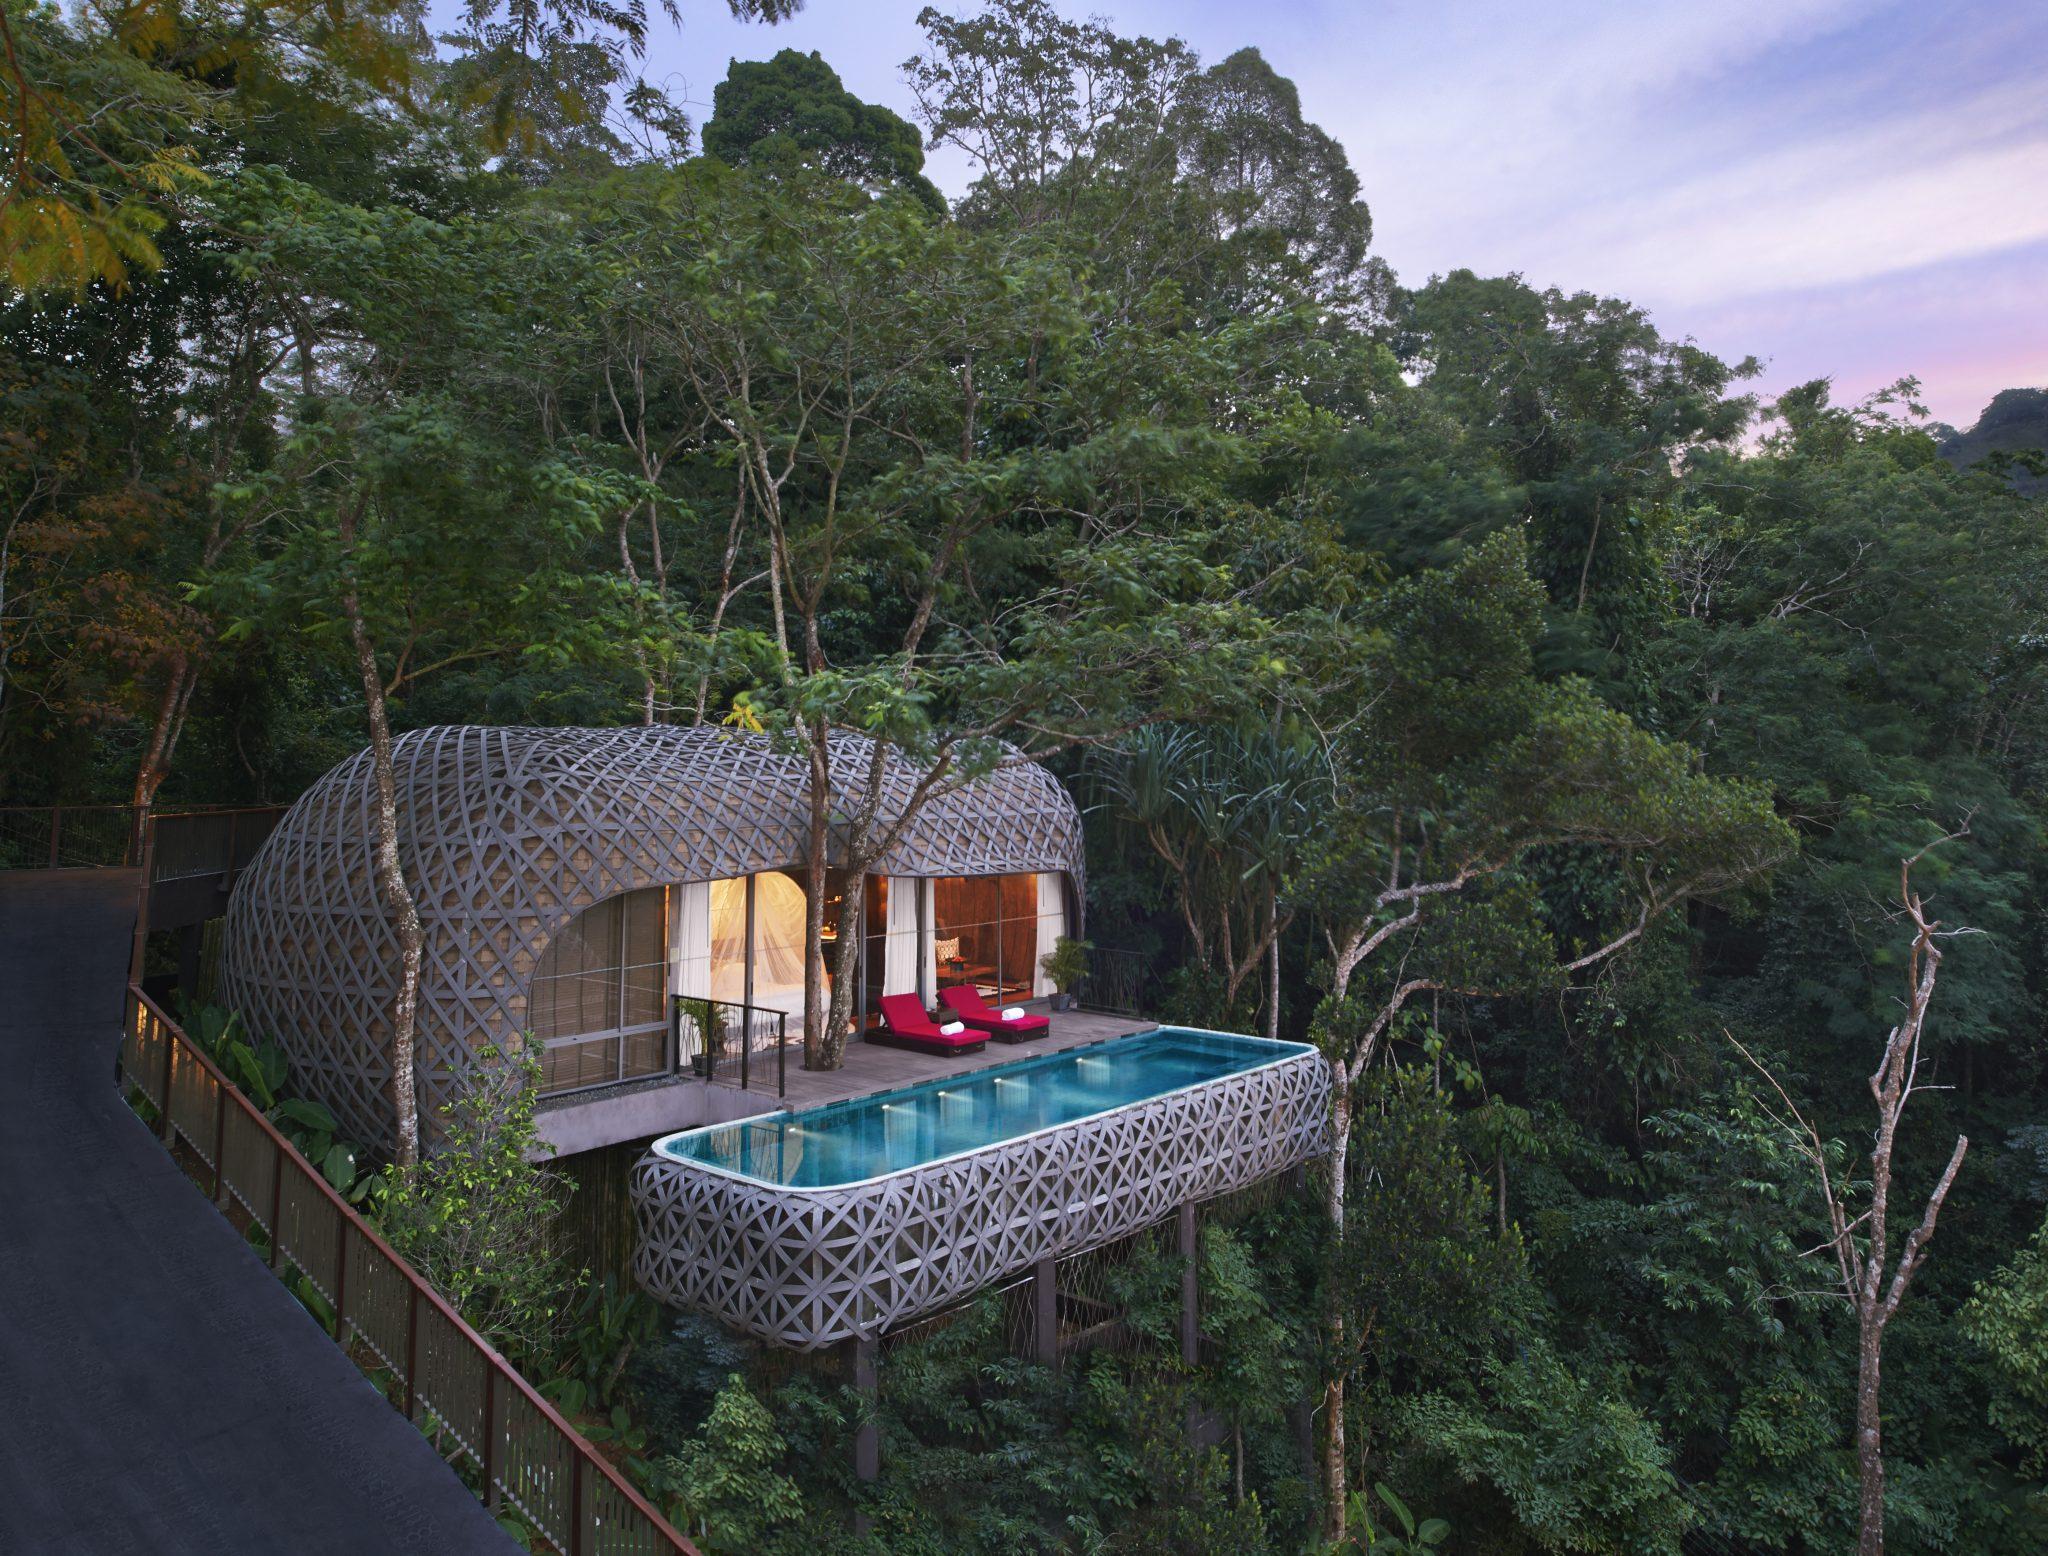 Bucket list trips - Birds Nest Pool Villa Phuket, Thailand